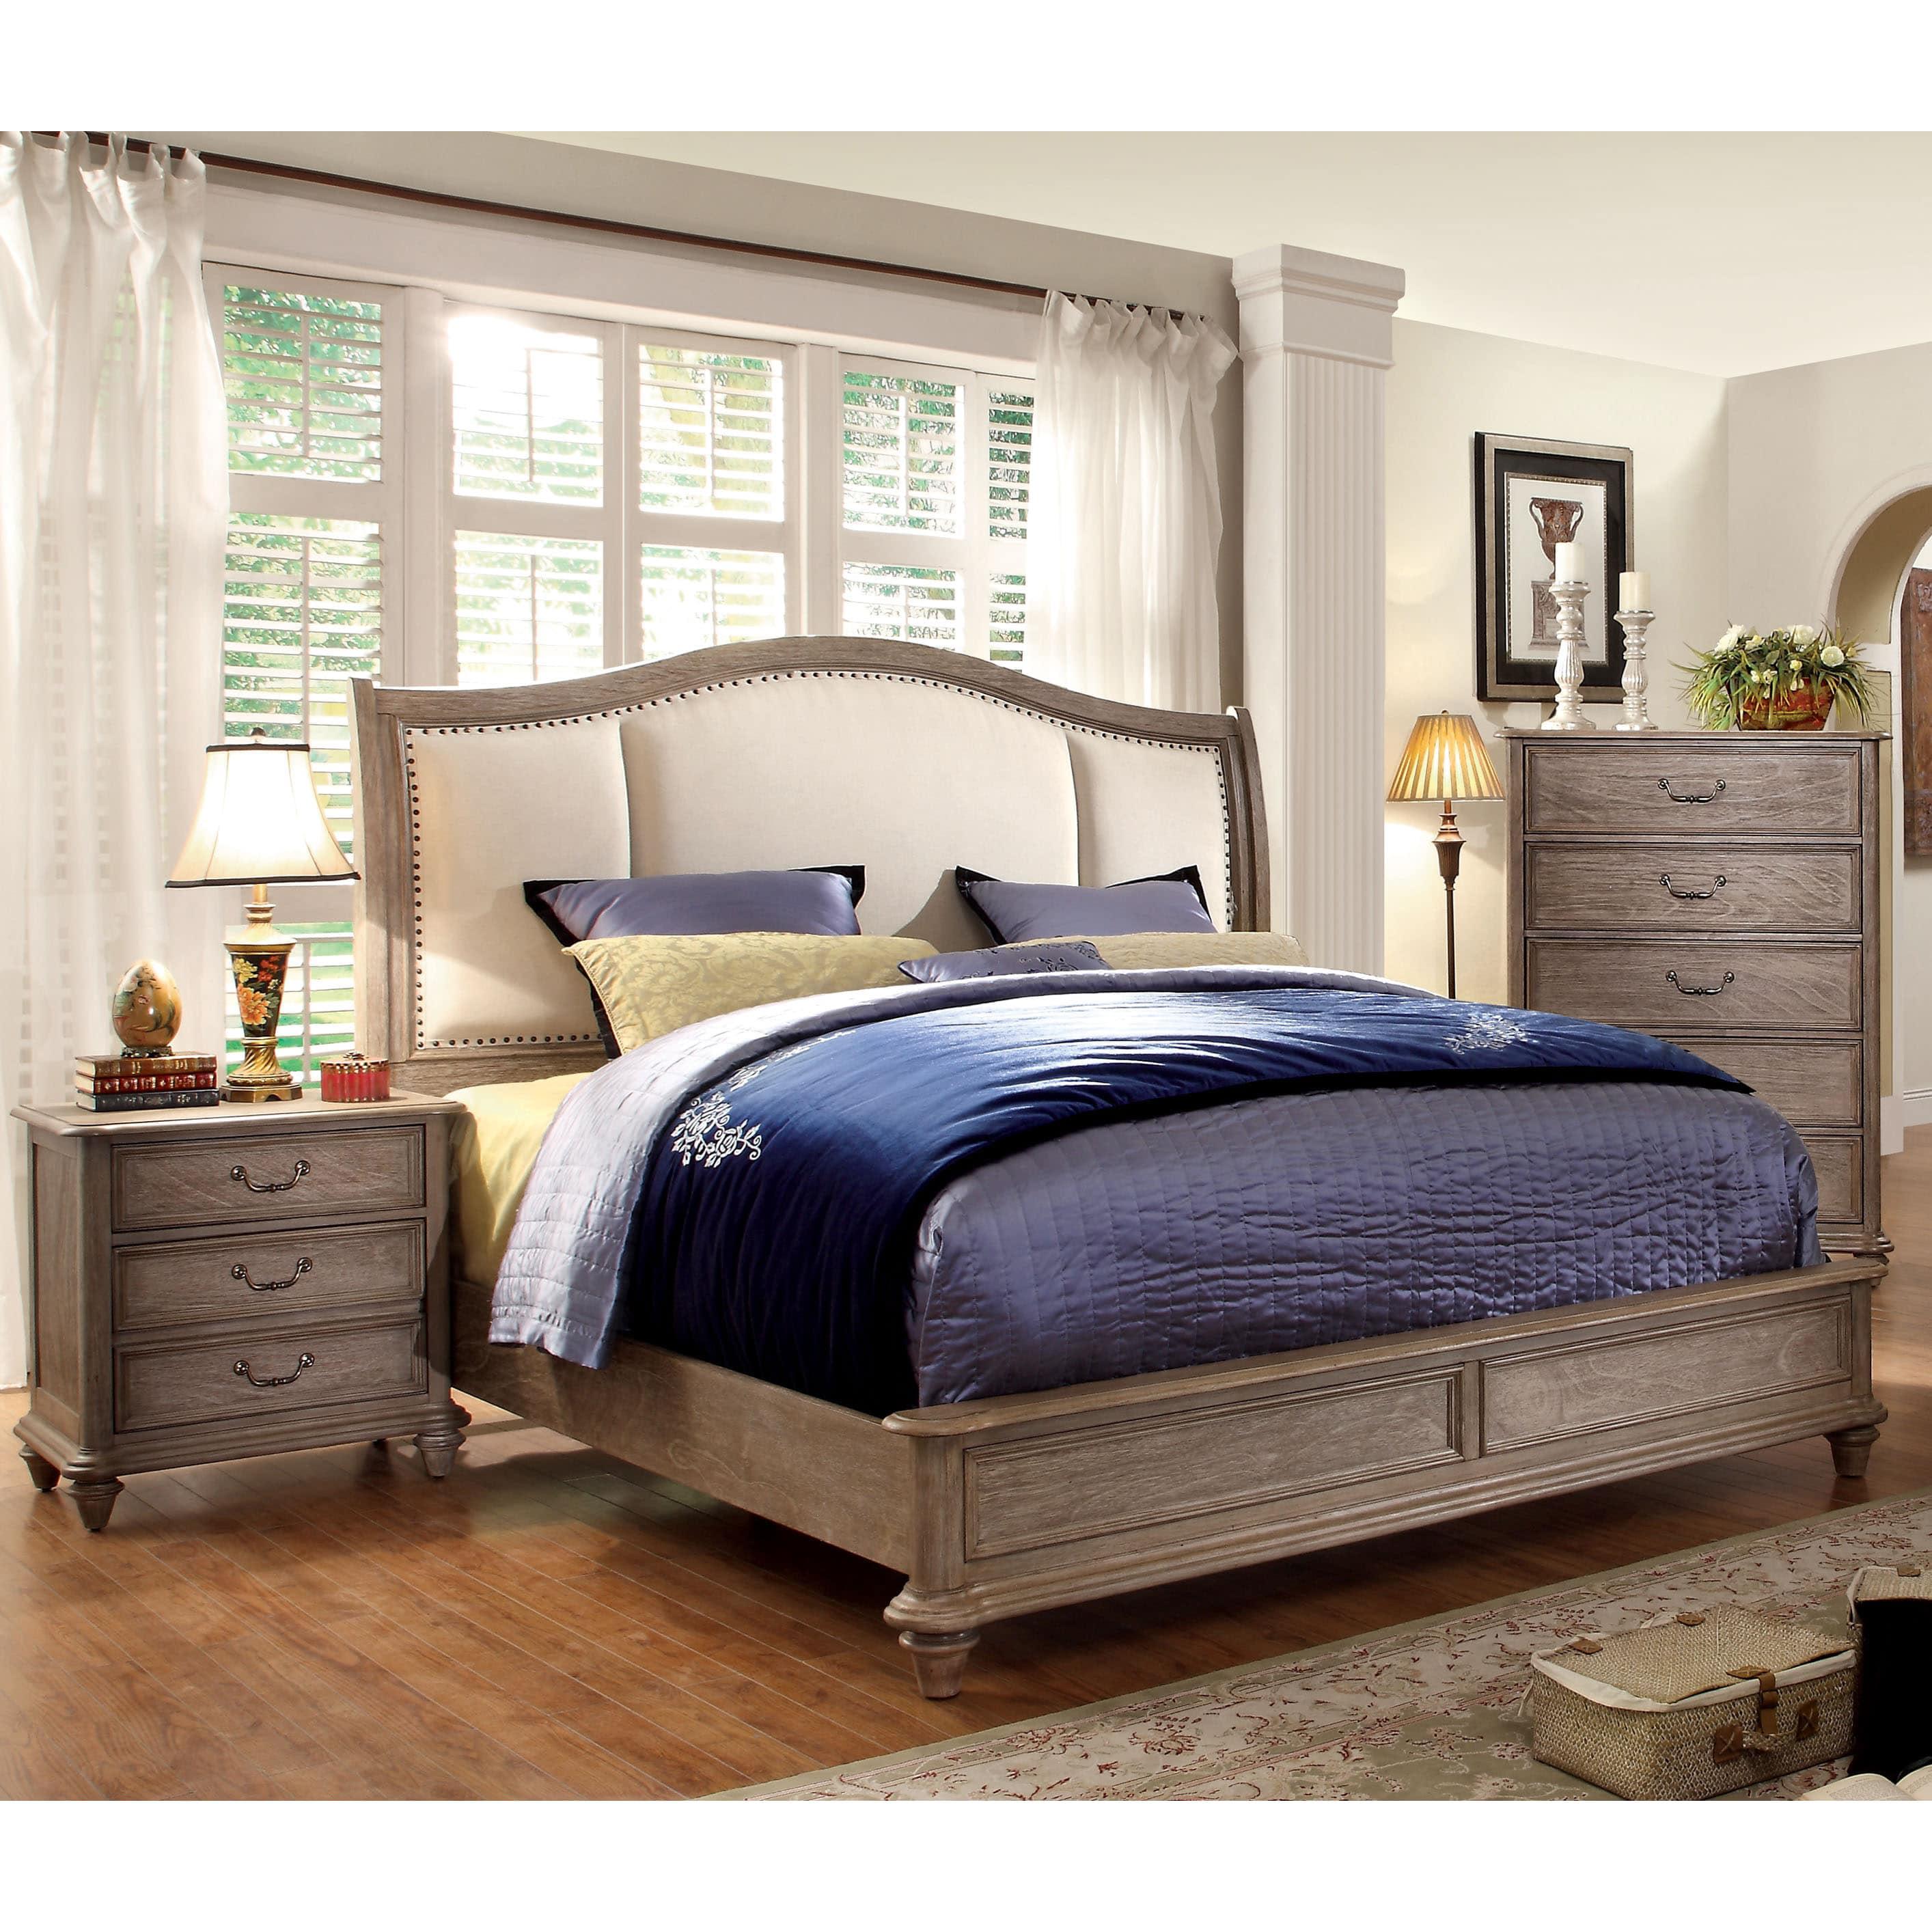 Furniture of America Minka II Rustic Grey 3-Piece Bedroom Set by Overstock